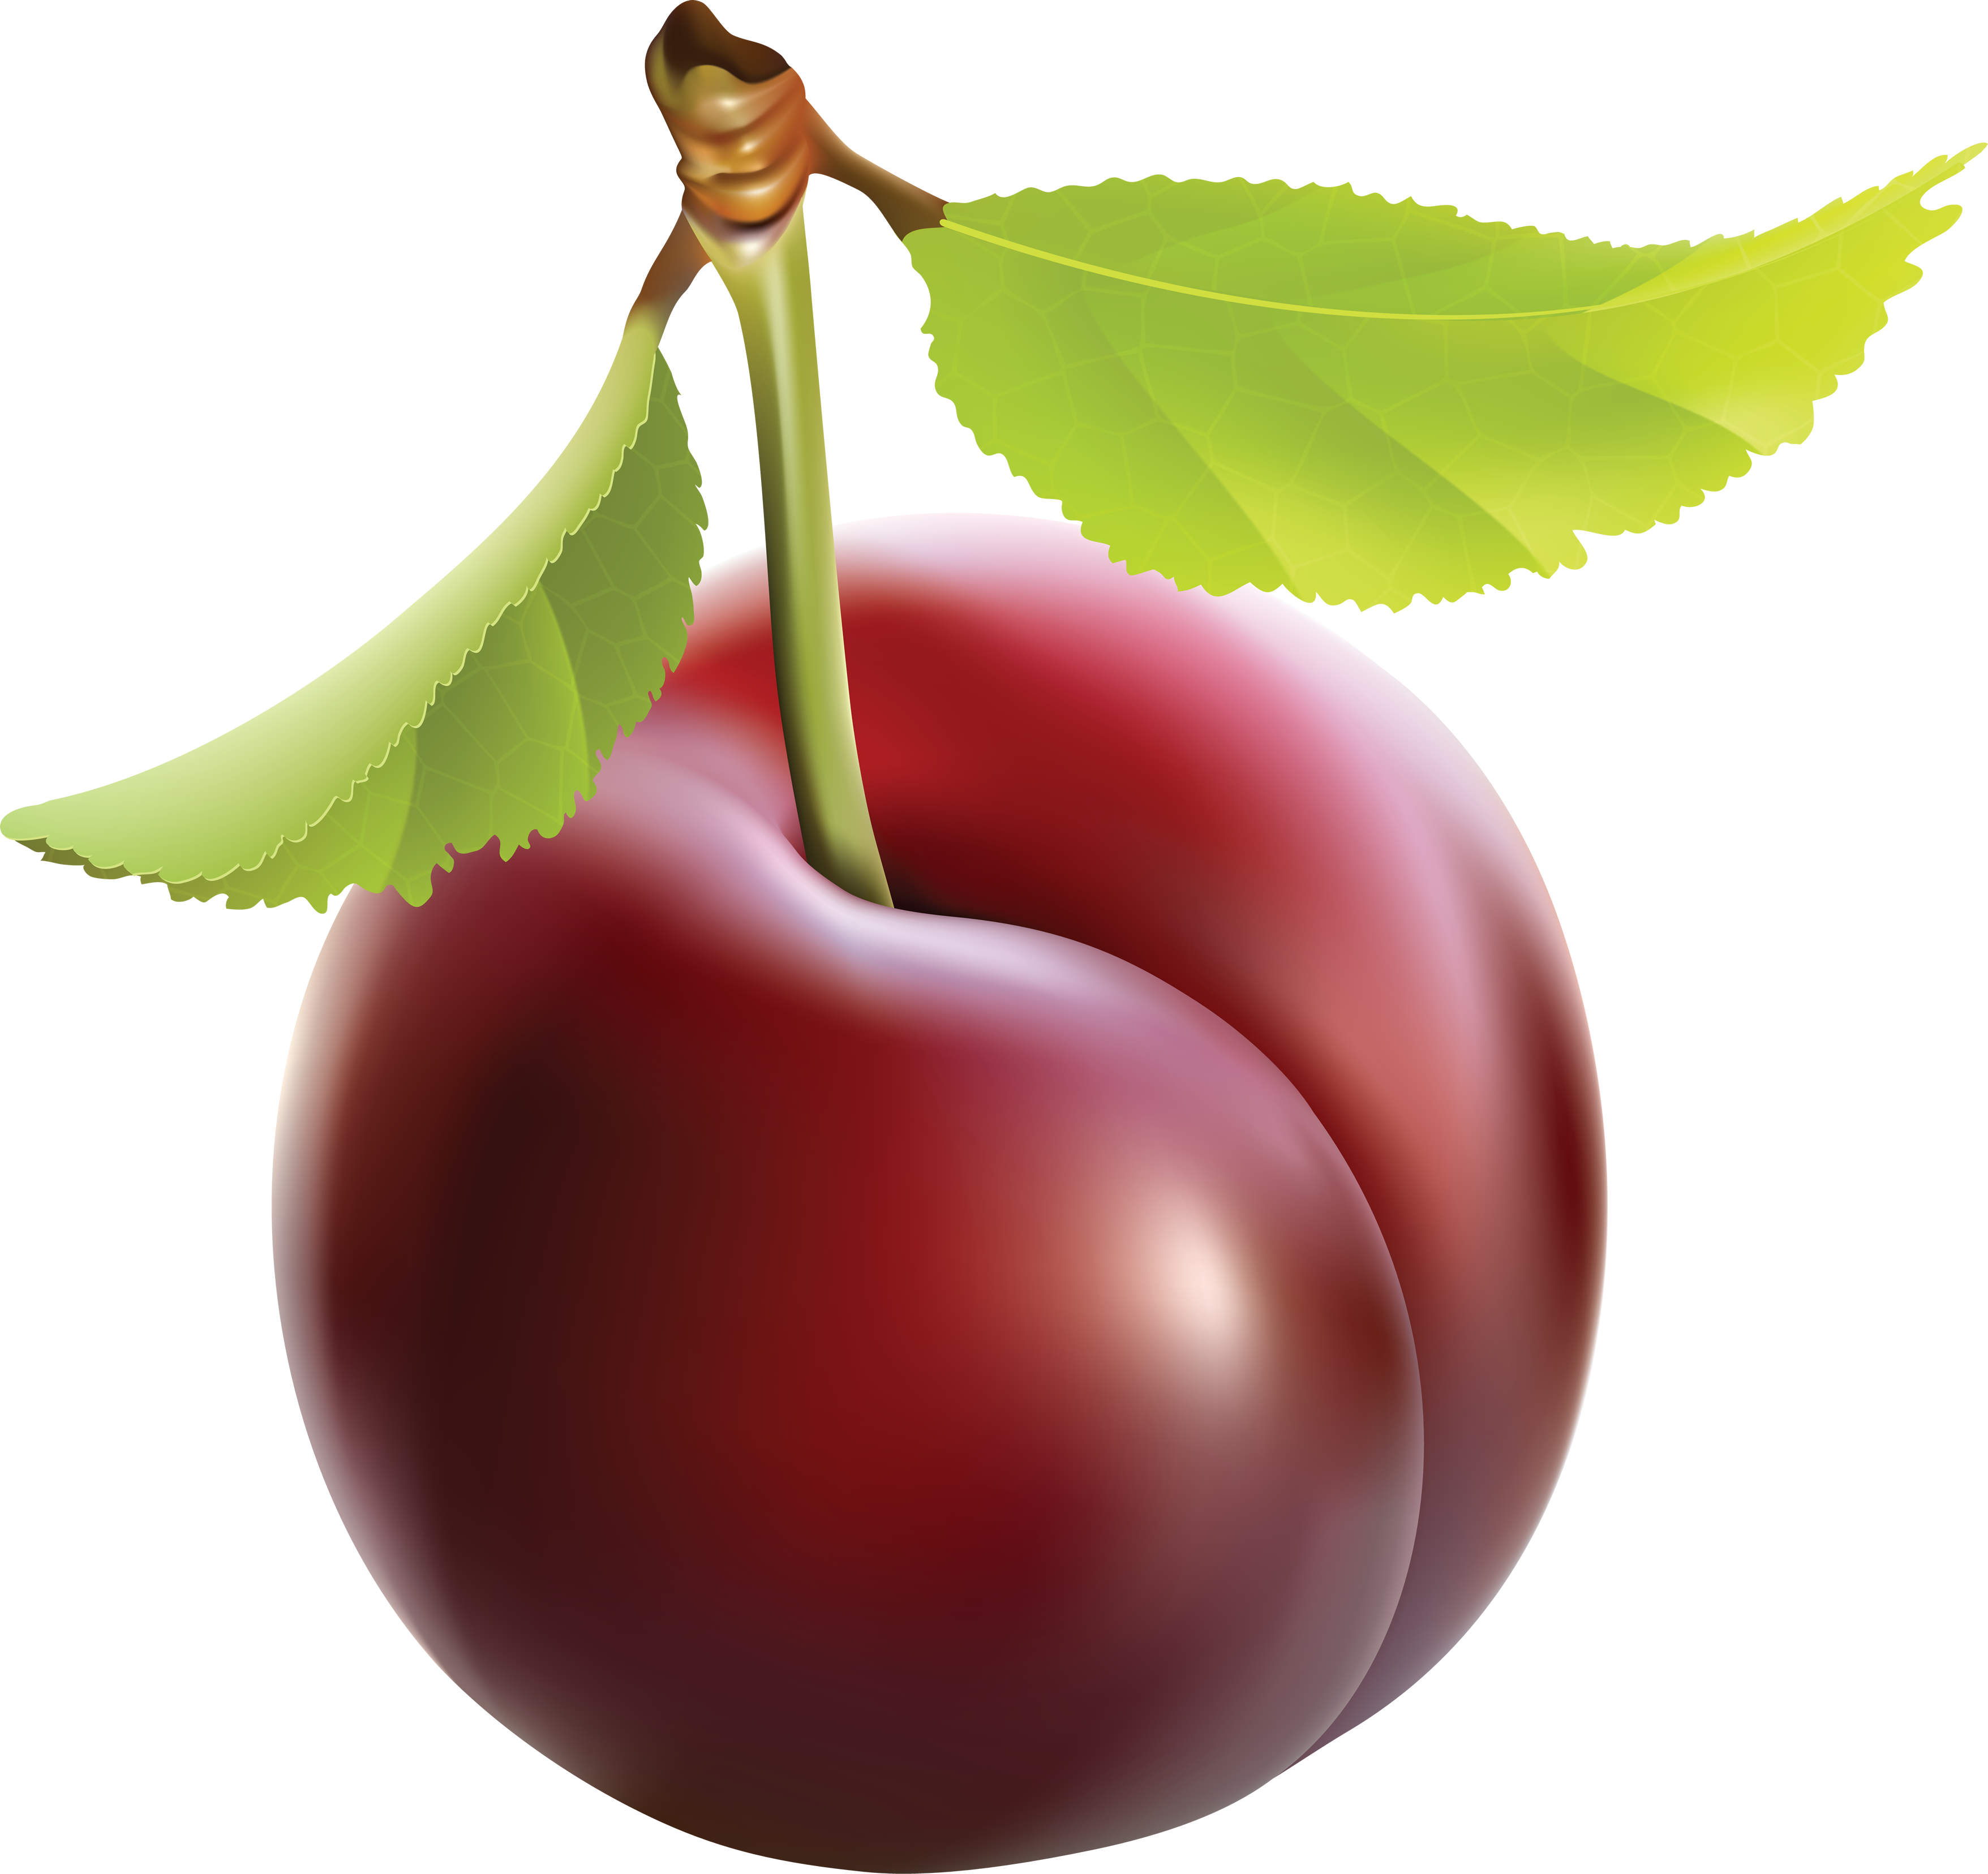 Clipart fruit single. Plum png images free